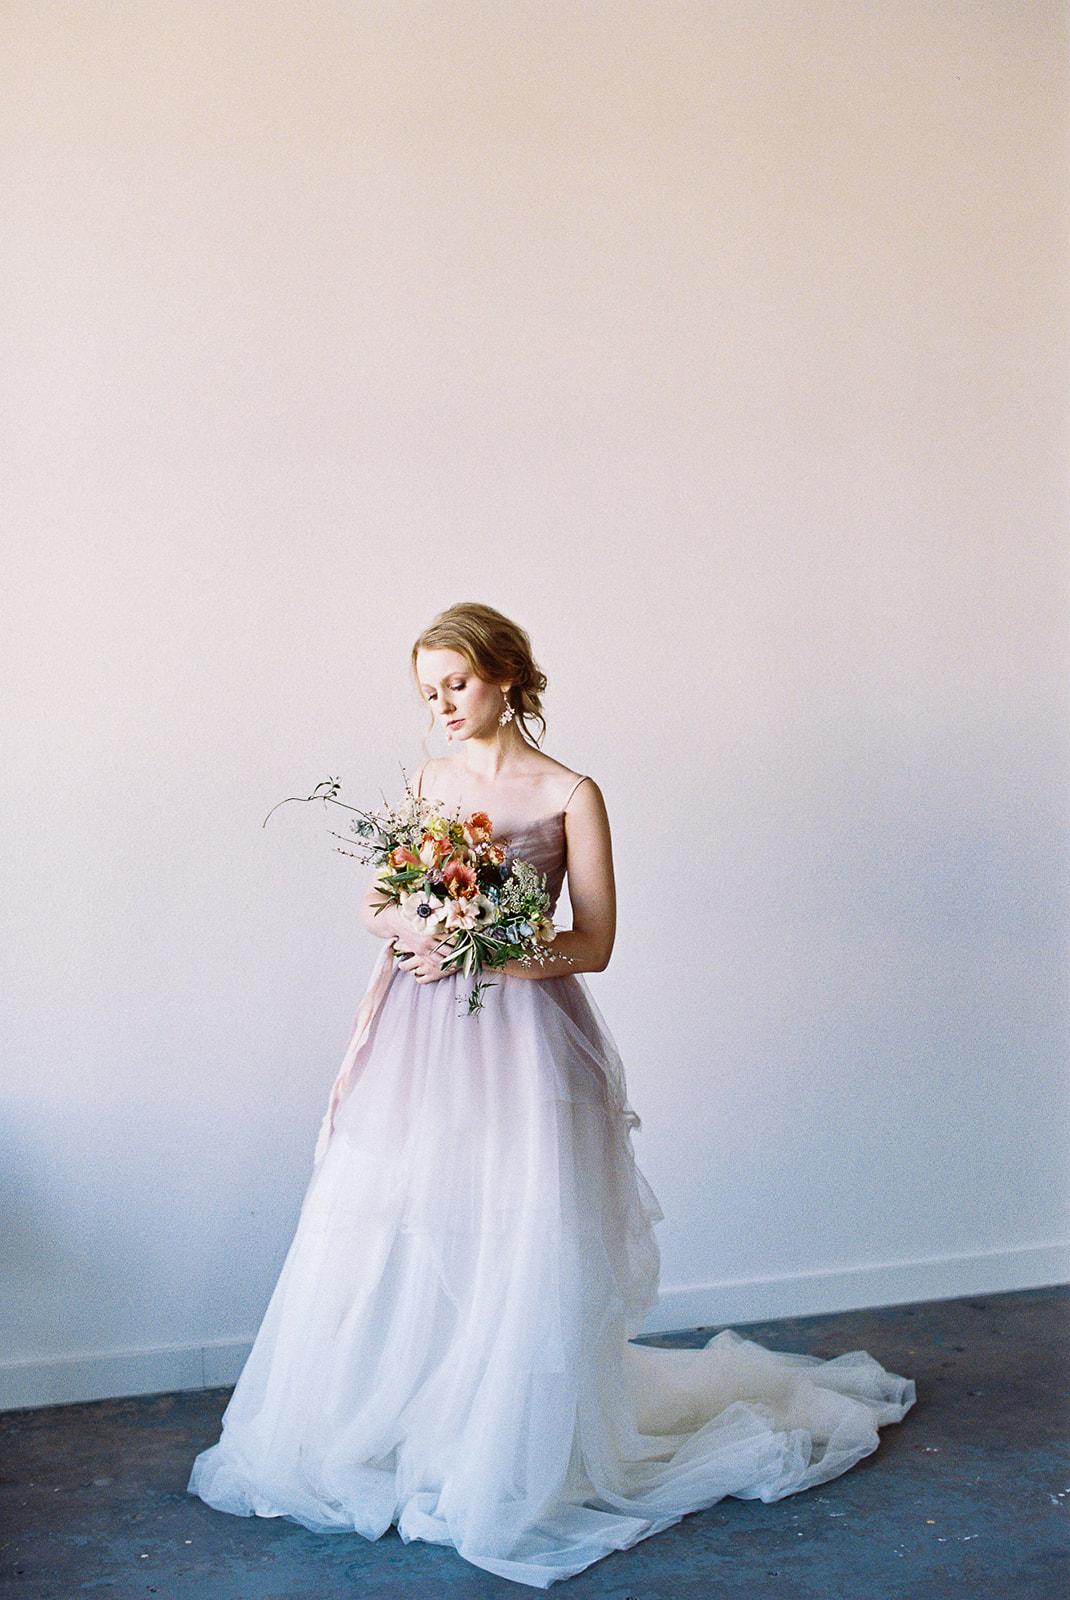 Etherial Spring Wedding Dress